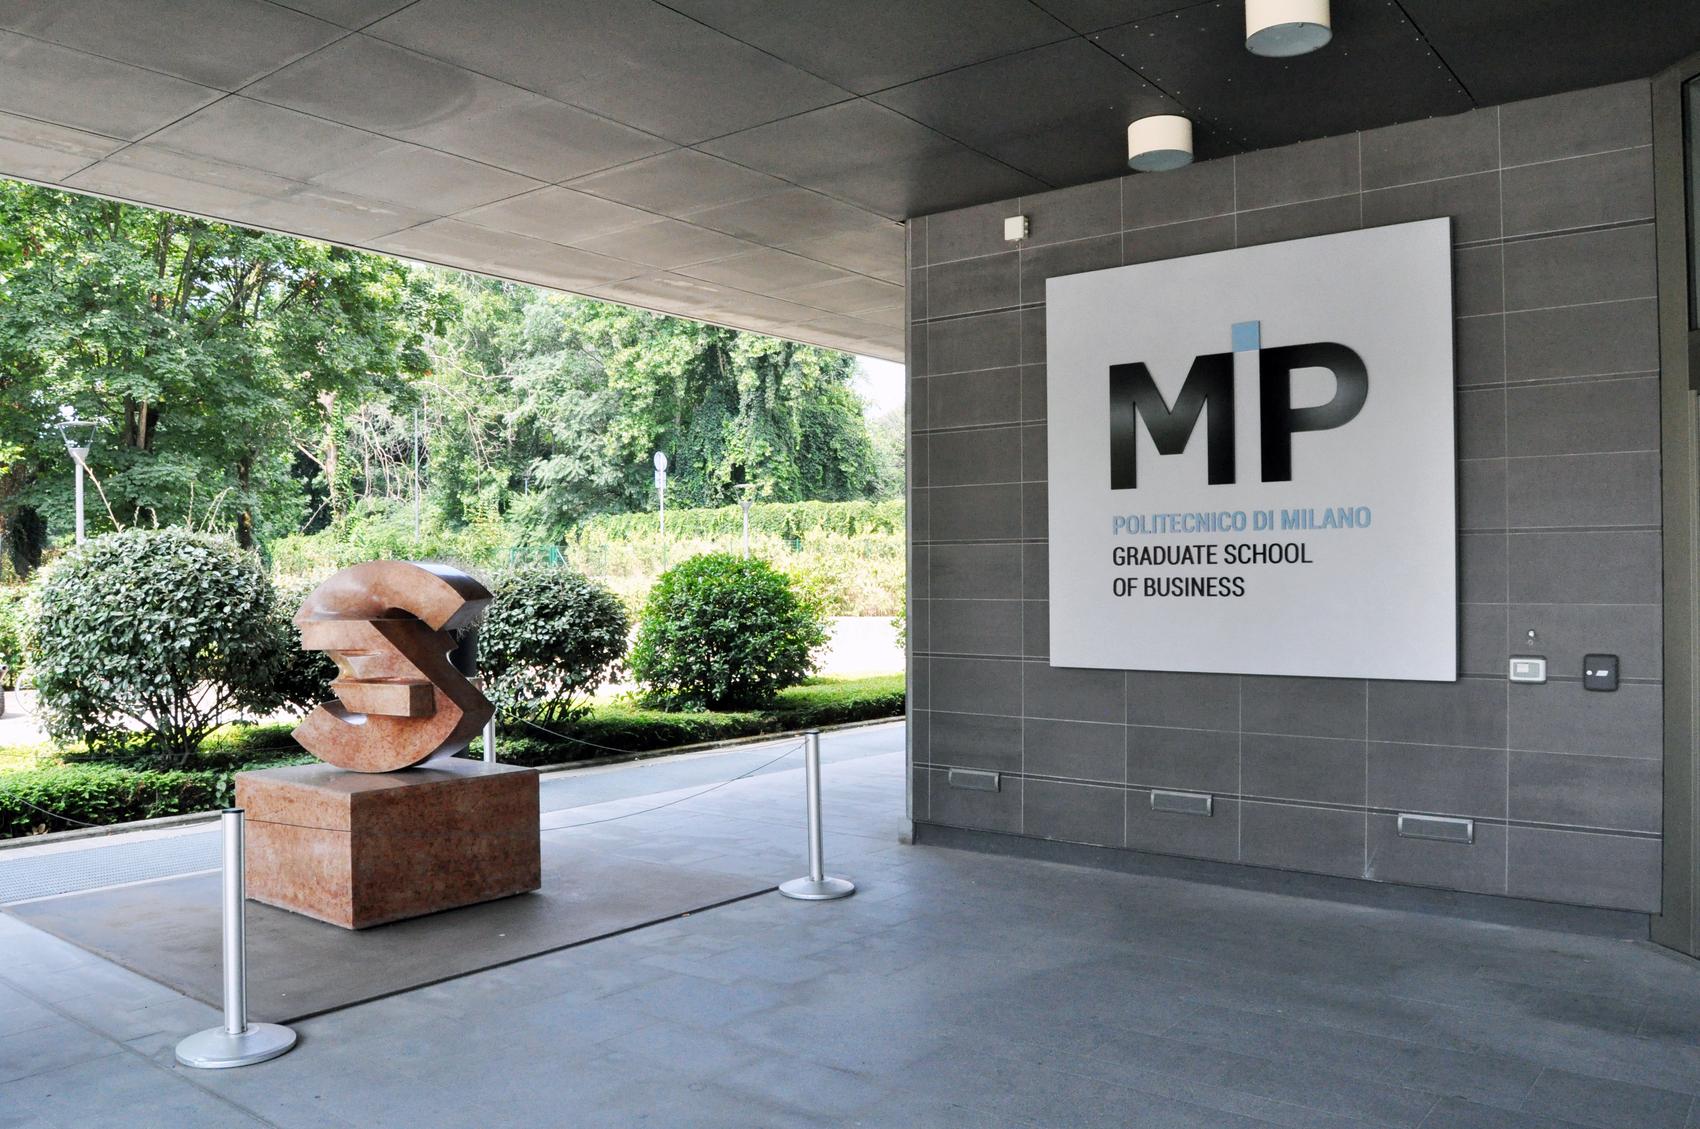 Interior design politecnico milano design school in the for Politecnico milano interior design